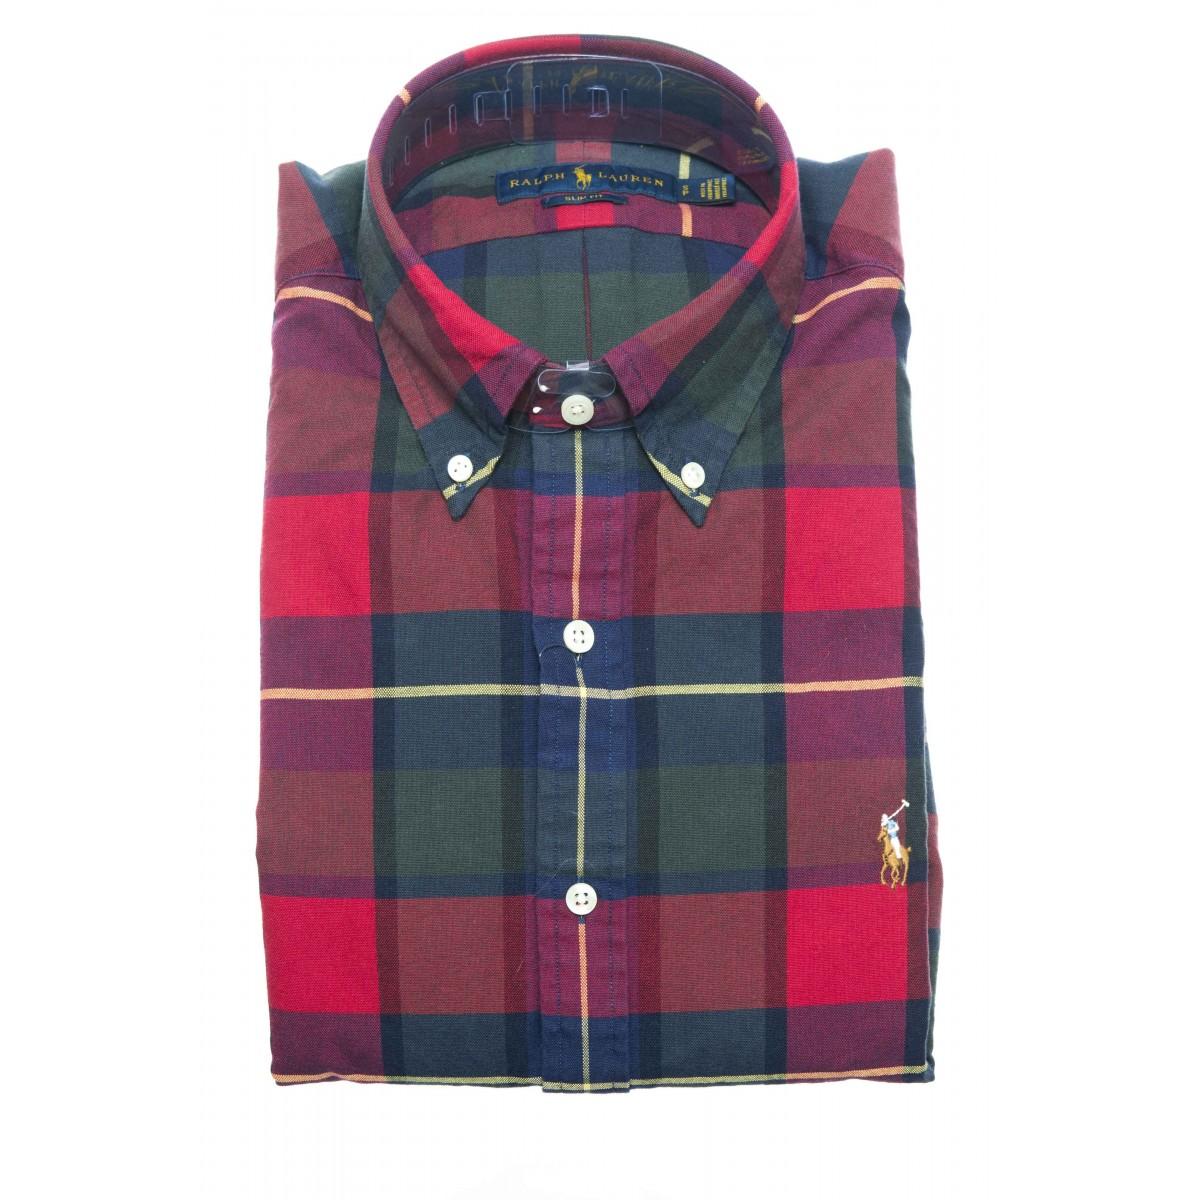 Camicia uomo - 767441 001 quadro slim